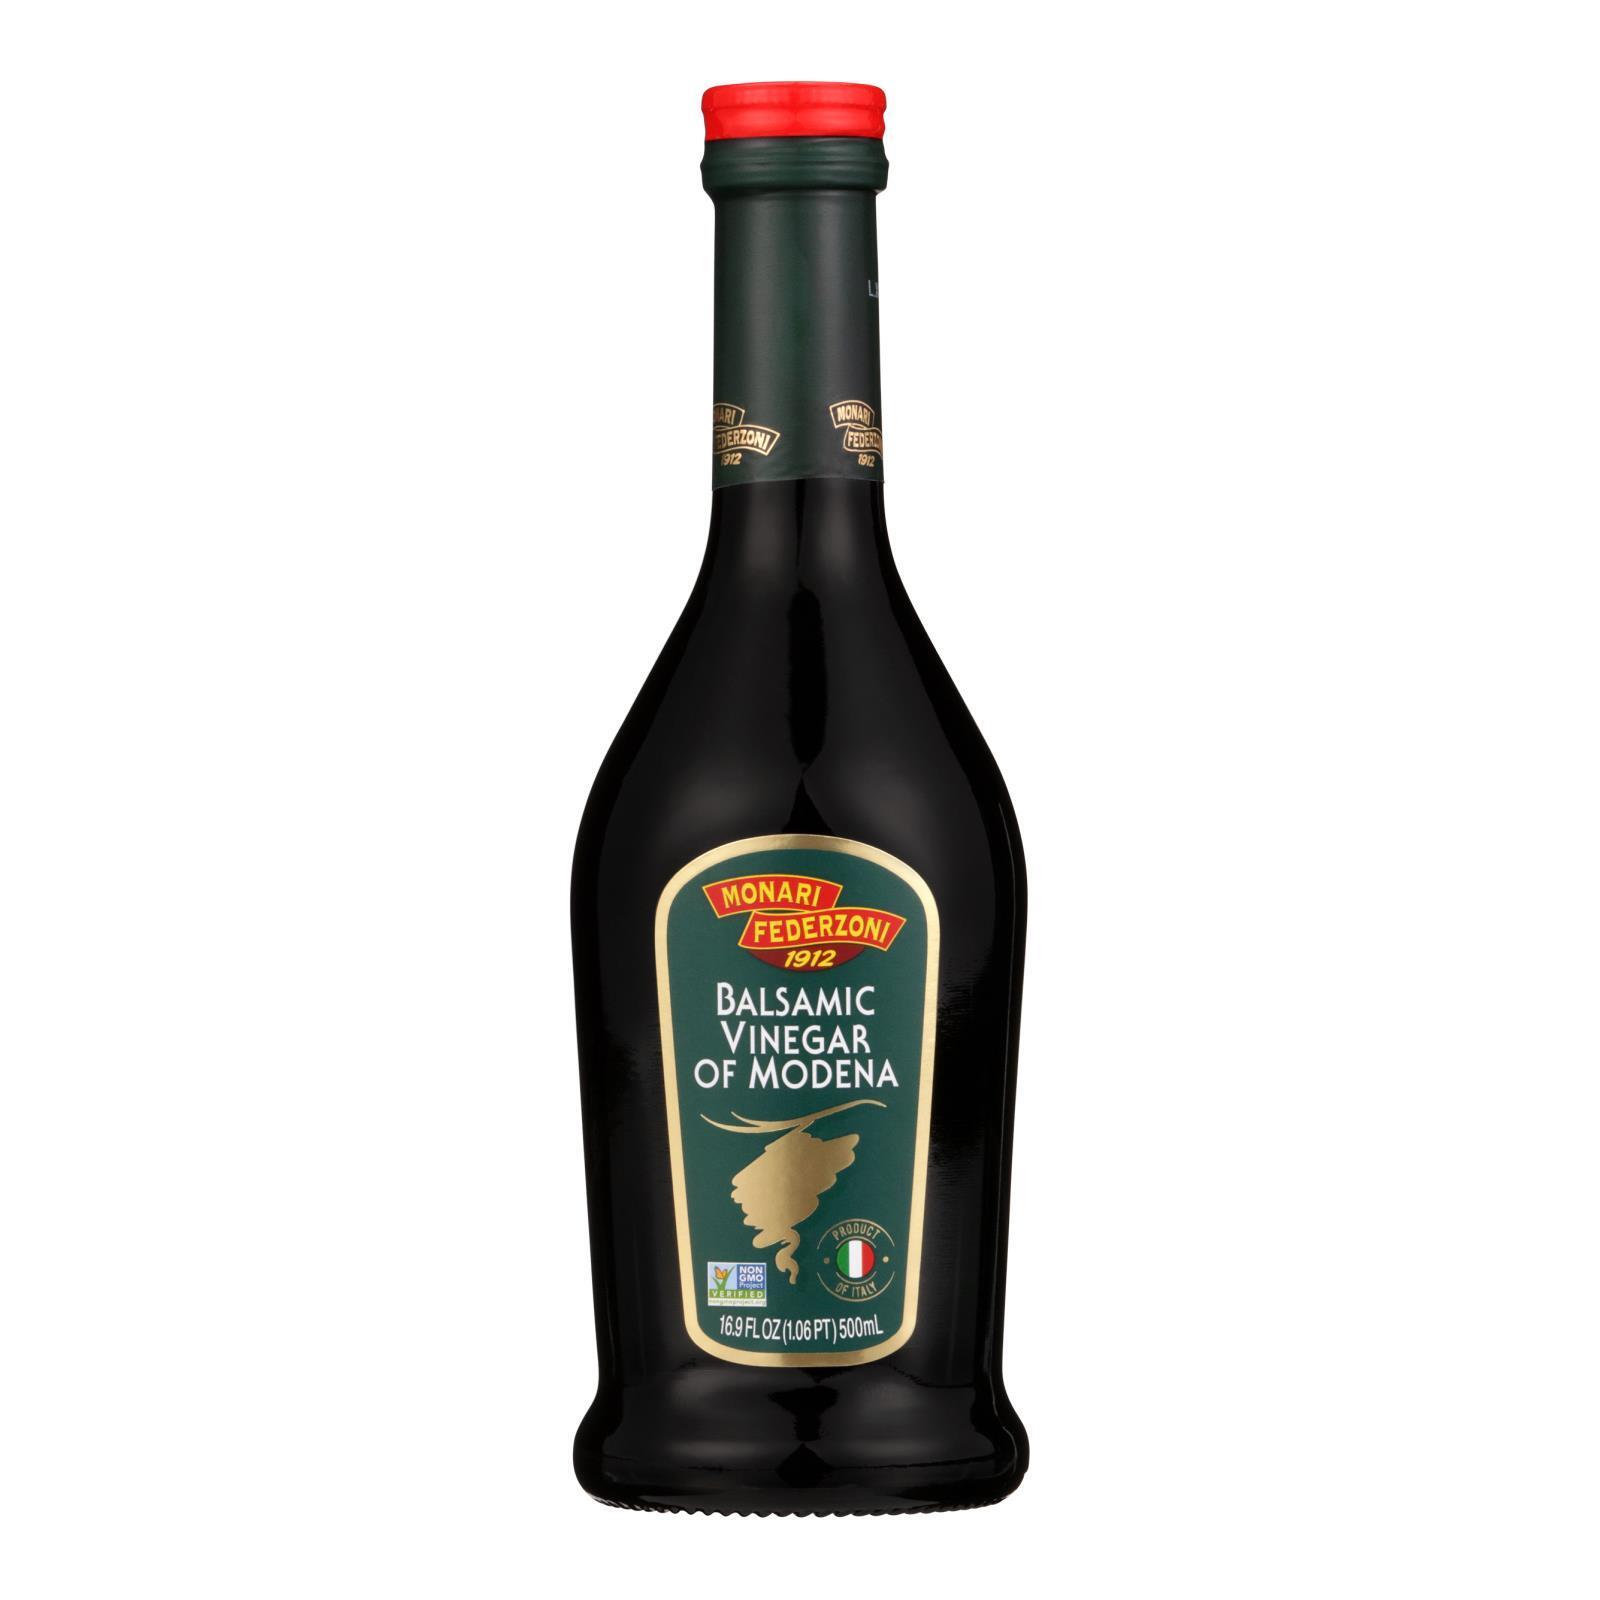 Monari Federzoni Balsamic Vinegar of Modena - Case of 6 - 16.9 Fl oz.